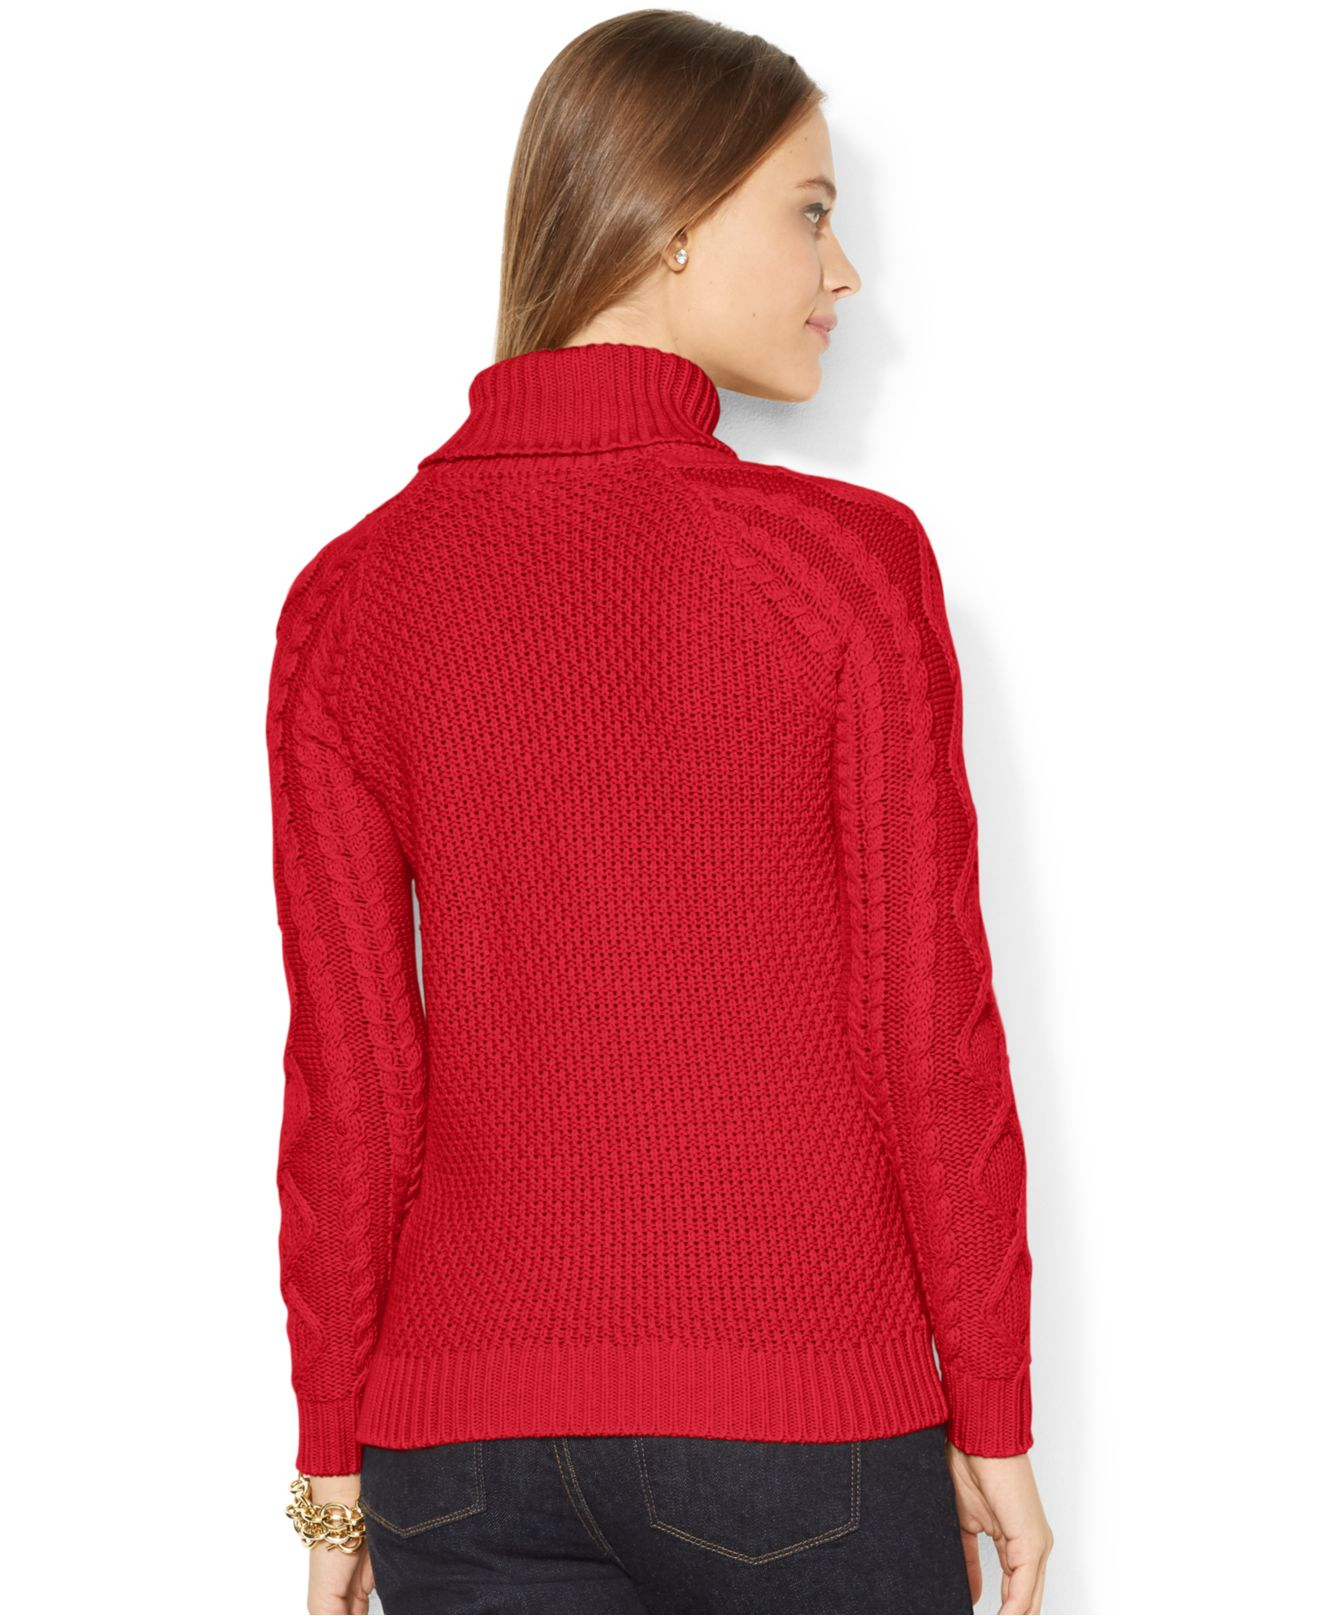 Lyst Lauren By Ralph Lauren Cable Knit Turtleneck Sweater In Red